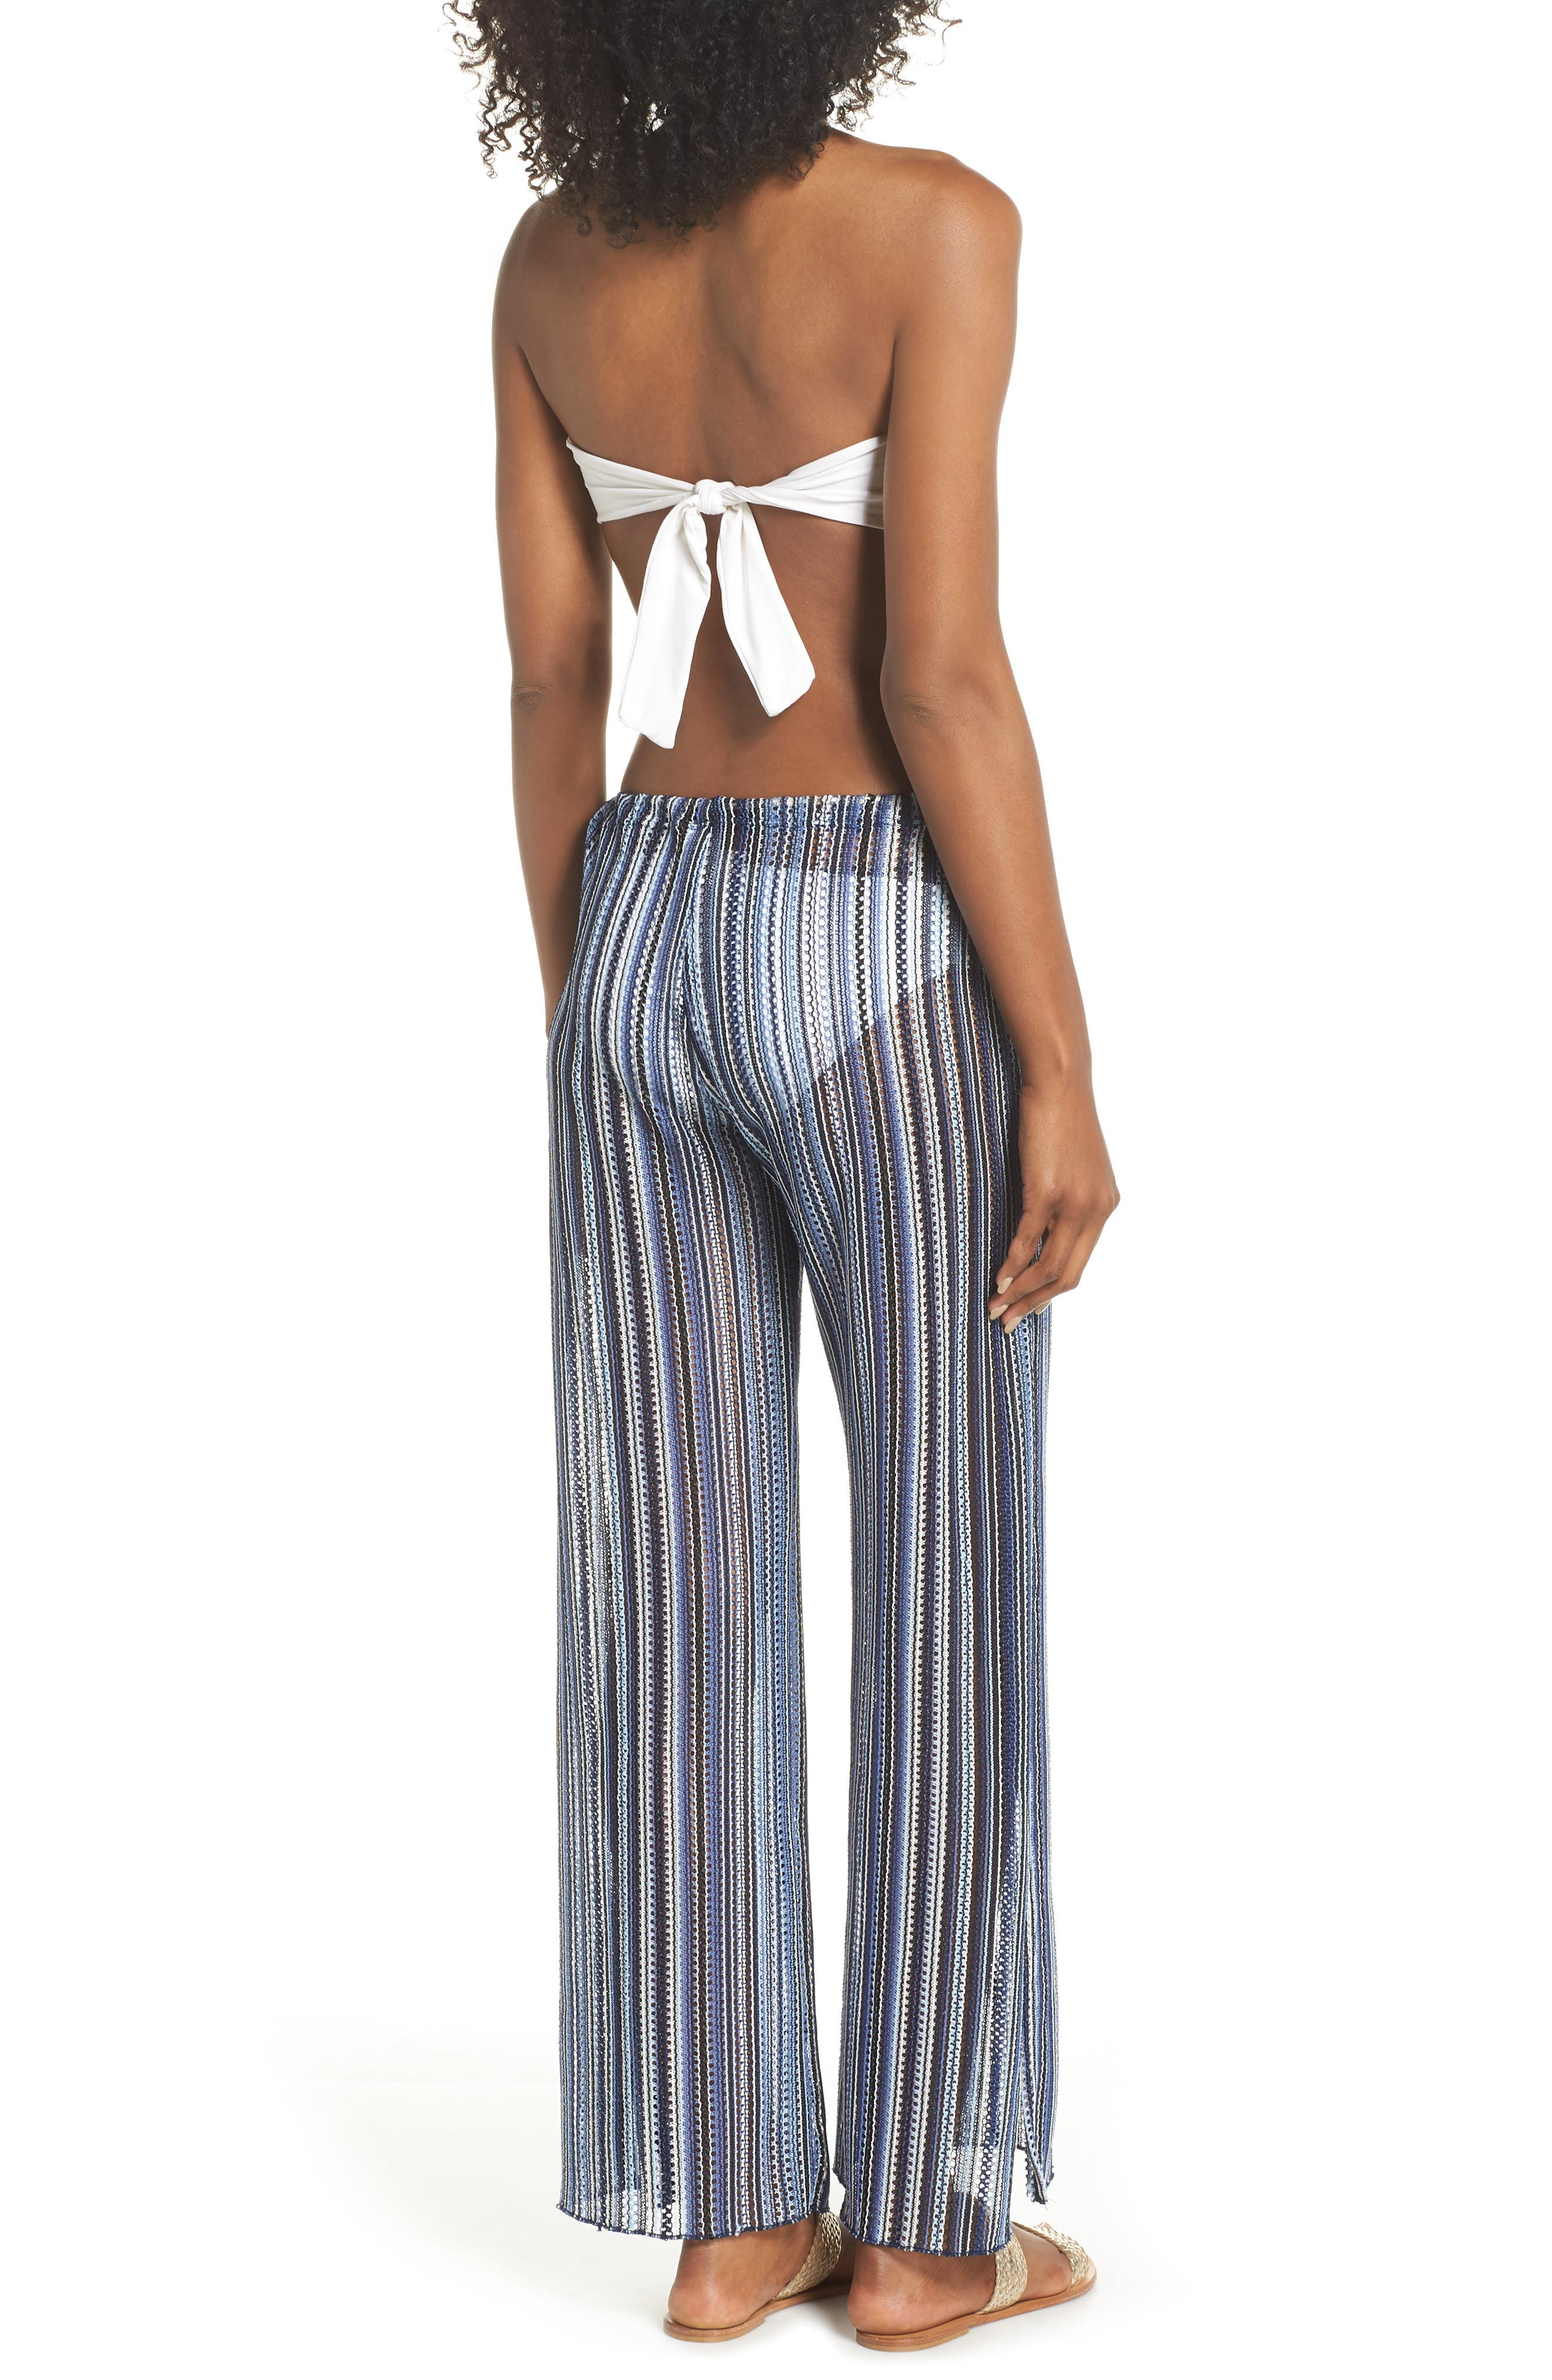 Pierside Cover-Up Flyaway Pants,                             Alternate thumbnail 2, color,                             INDIGO